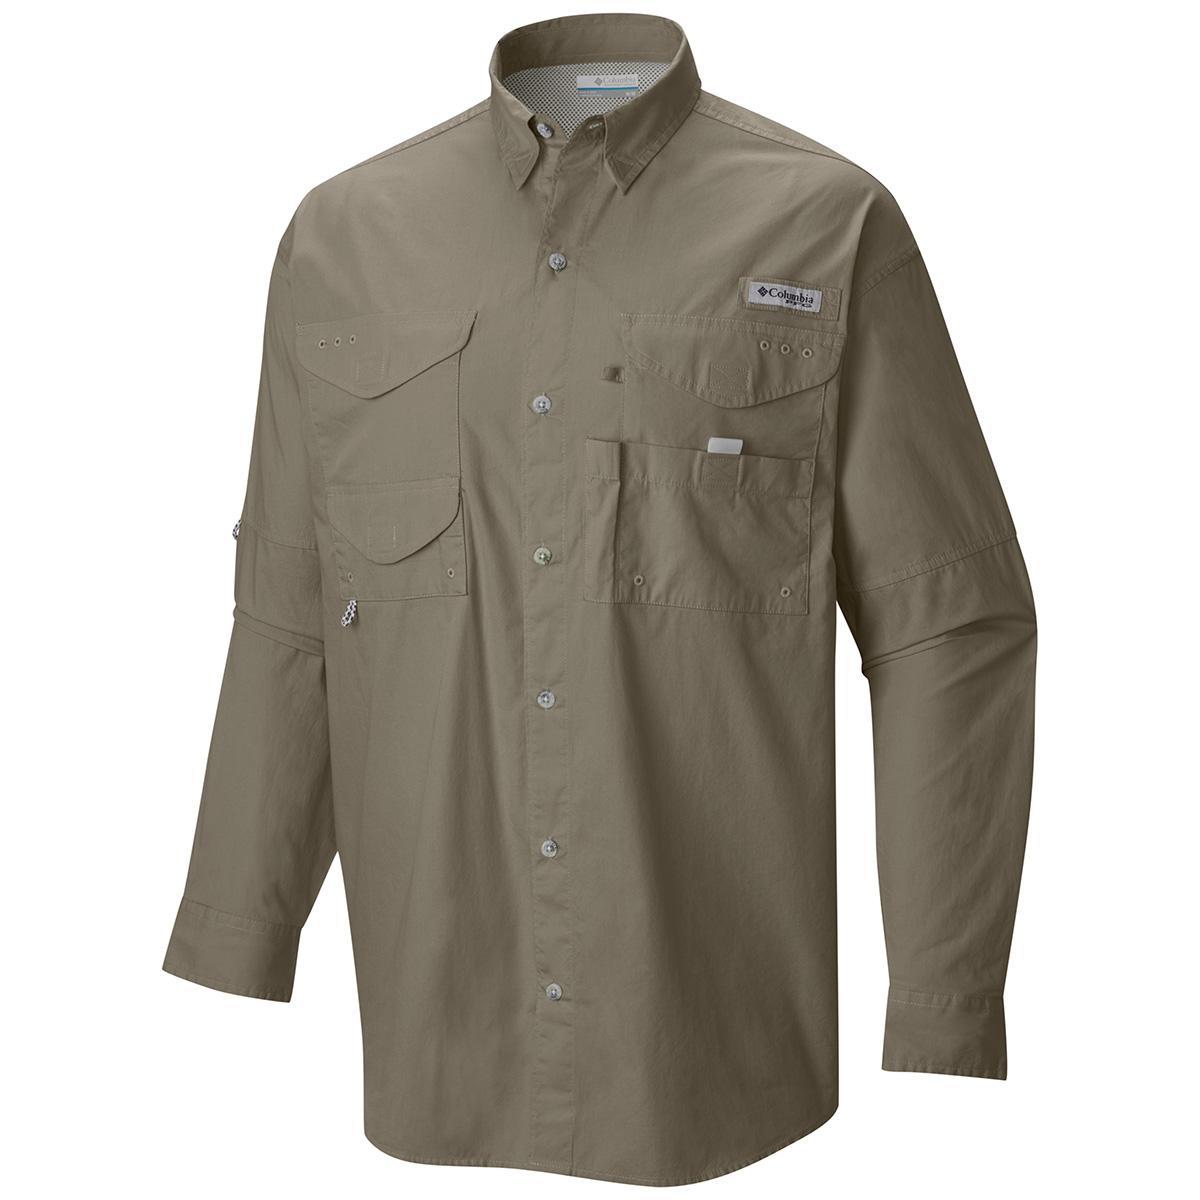 Columbia bonehead ls shirt fishing shirts taimen for Columbia bonehead fishing shirt